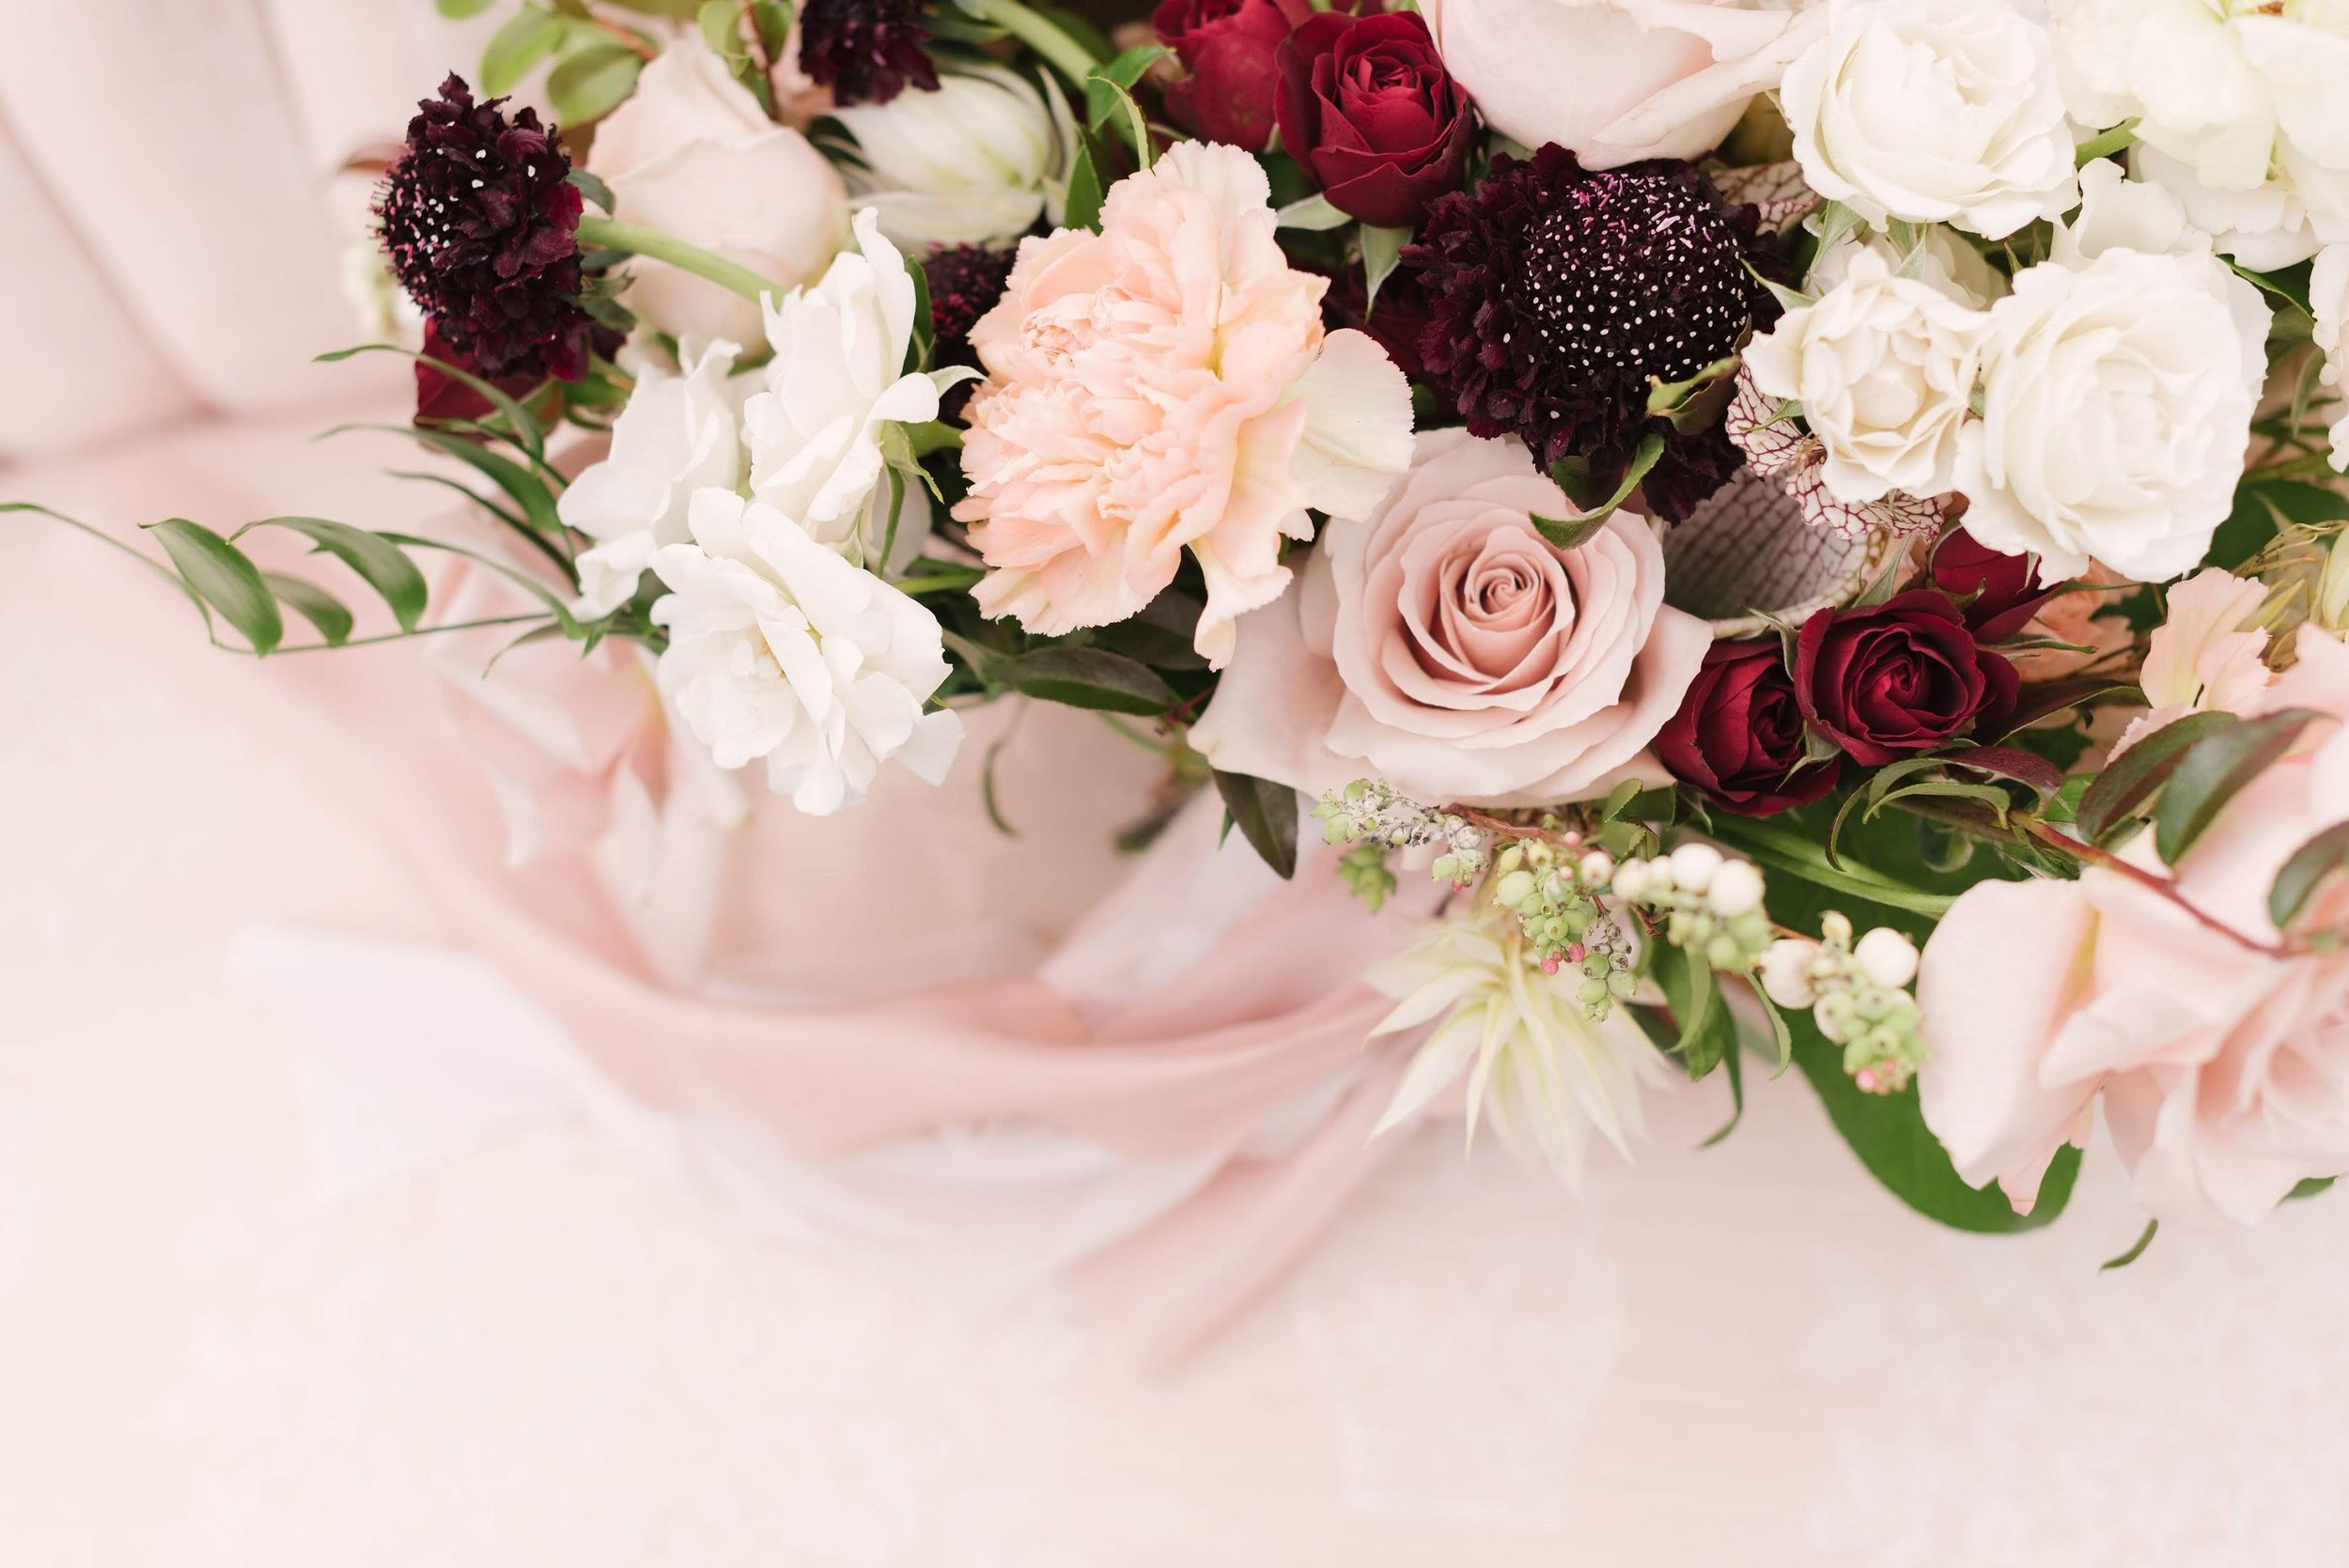 Field-Gems-Photography-Detroit-Michigan-Wedding-Photographer-Family-Photographer-Photobooth-090818-6706.jpg